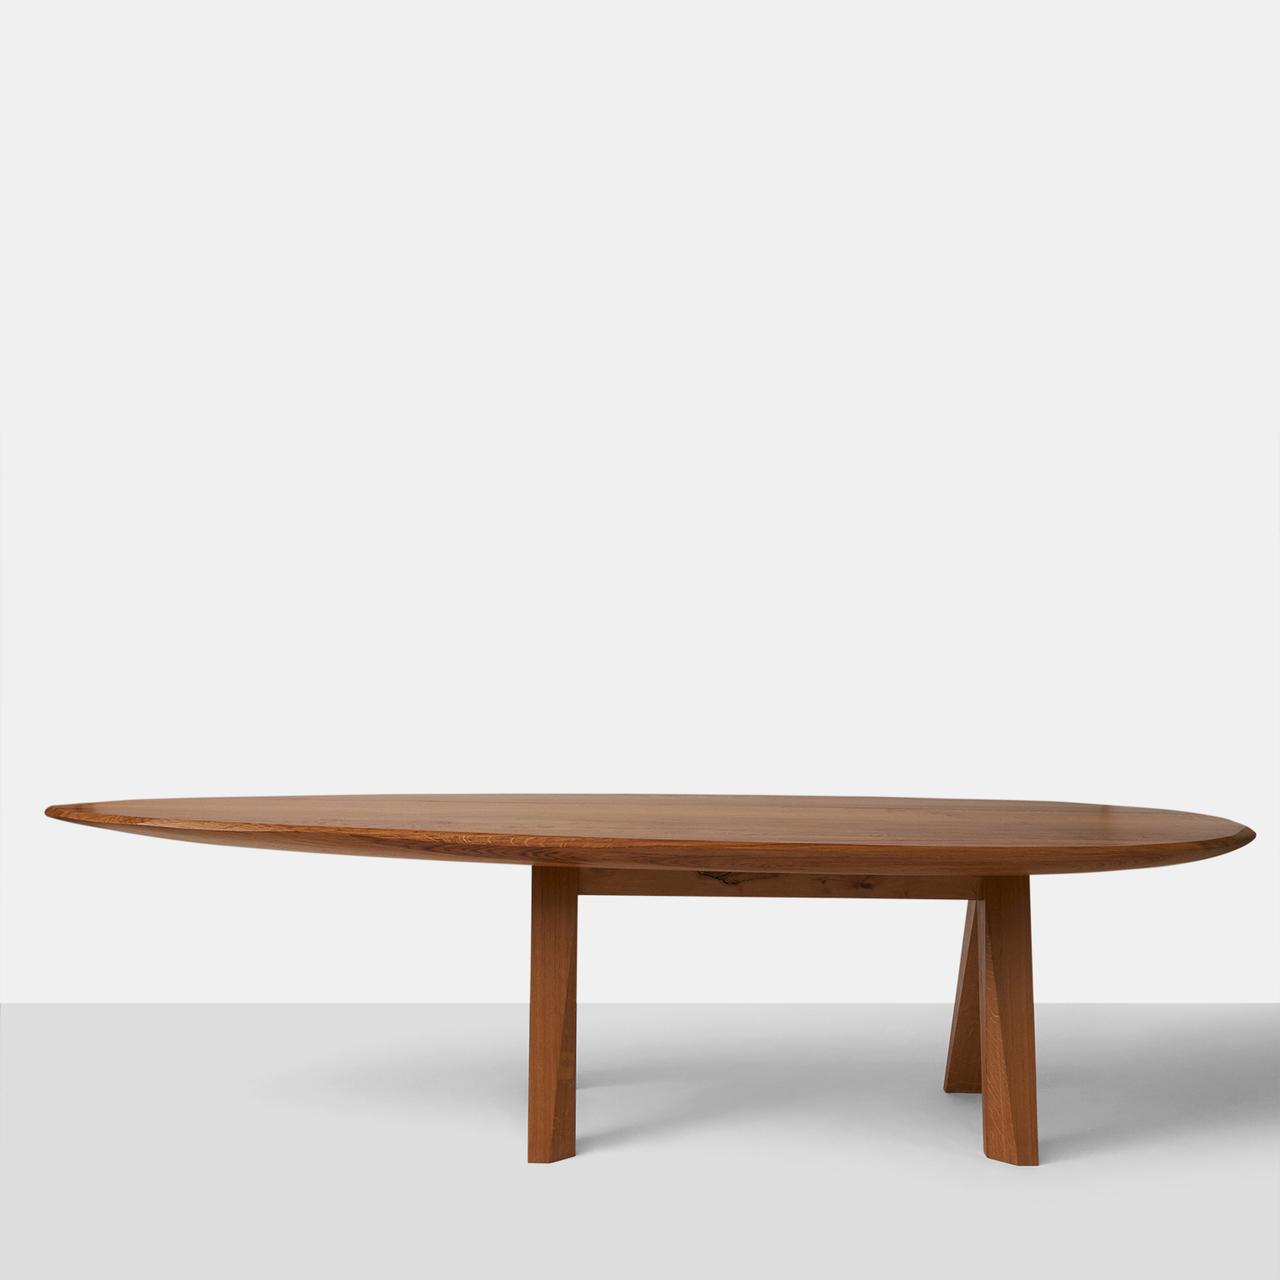 Designmobel Aus Holz Kaspar Hamacher